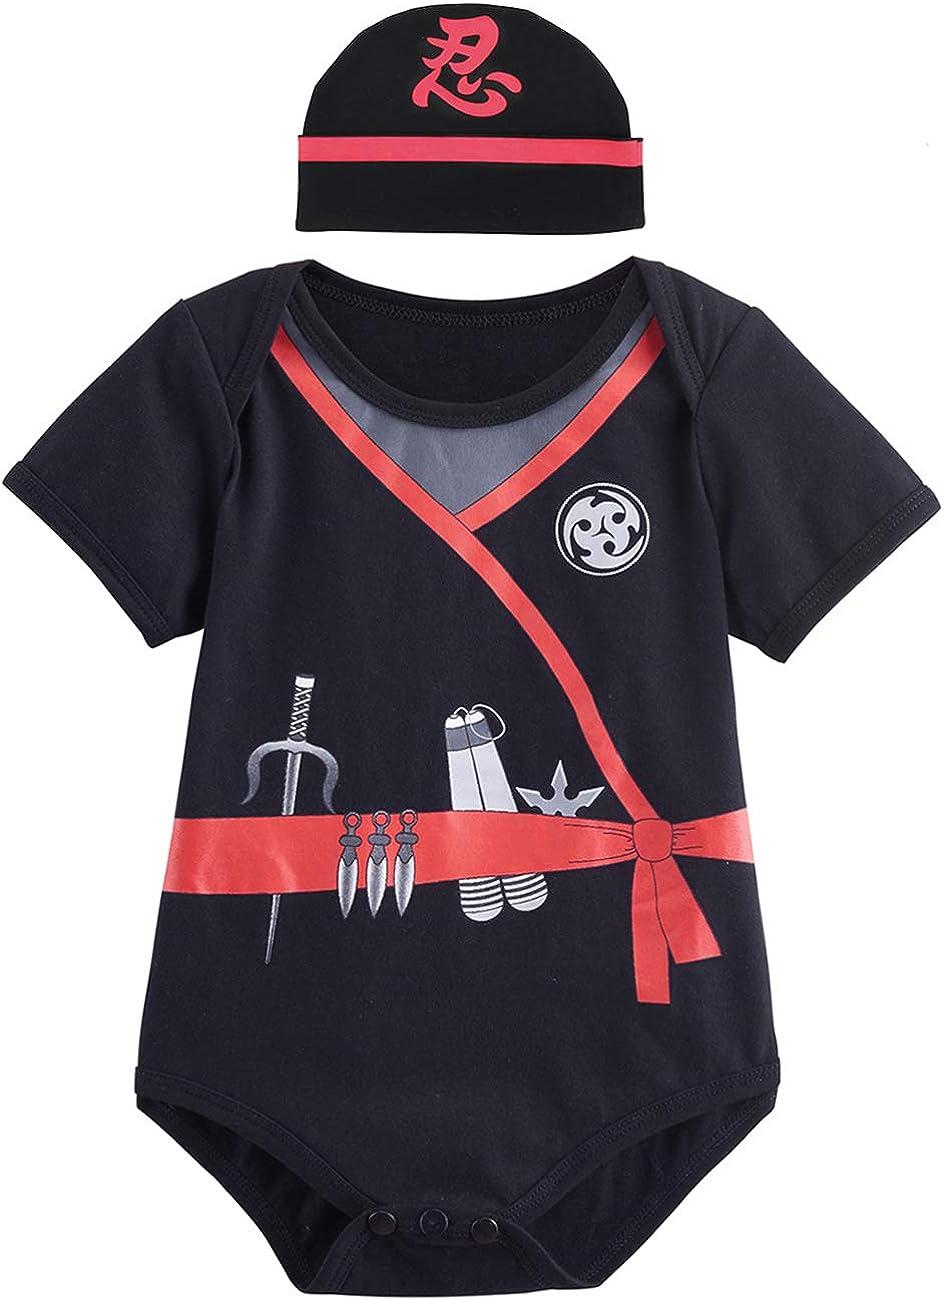 COSLAND Baby Boys' Ninja Short Sleeve Bodysuit with Hat